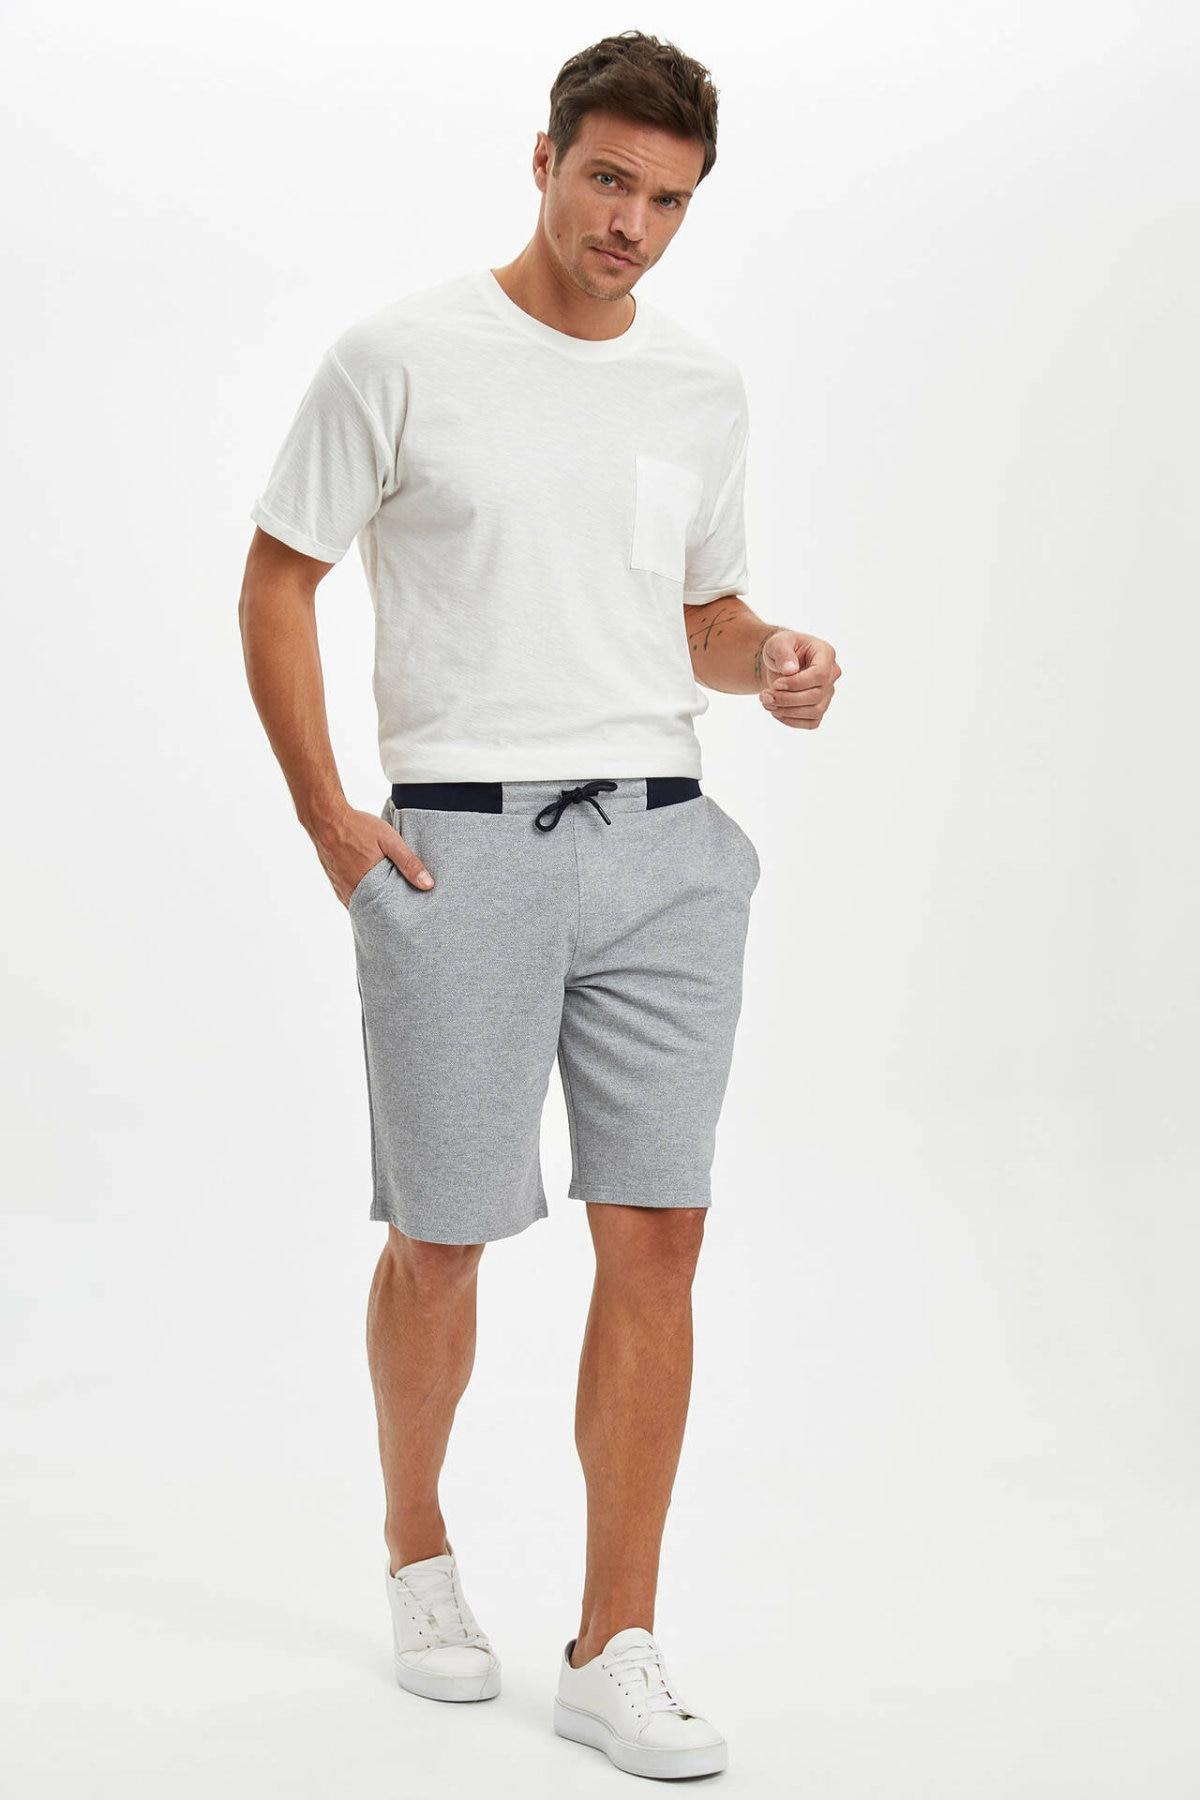 DeFacto Man's Short Bottoms Men's Light Grey Casual Shorts Men's Lace-up Adjustable Shorts-N7213AZ20SM